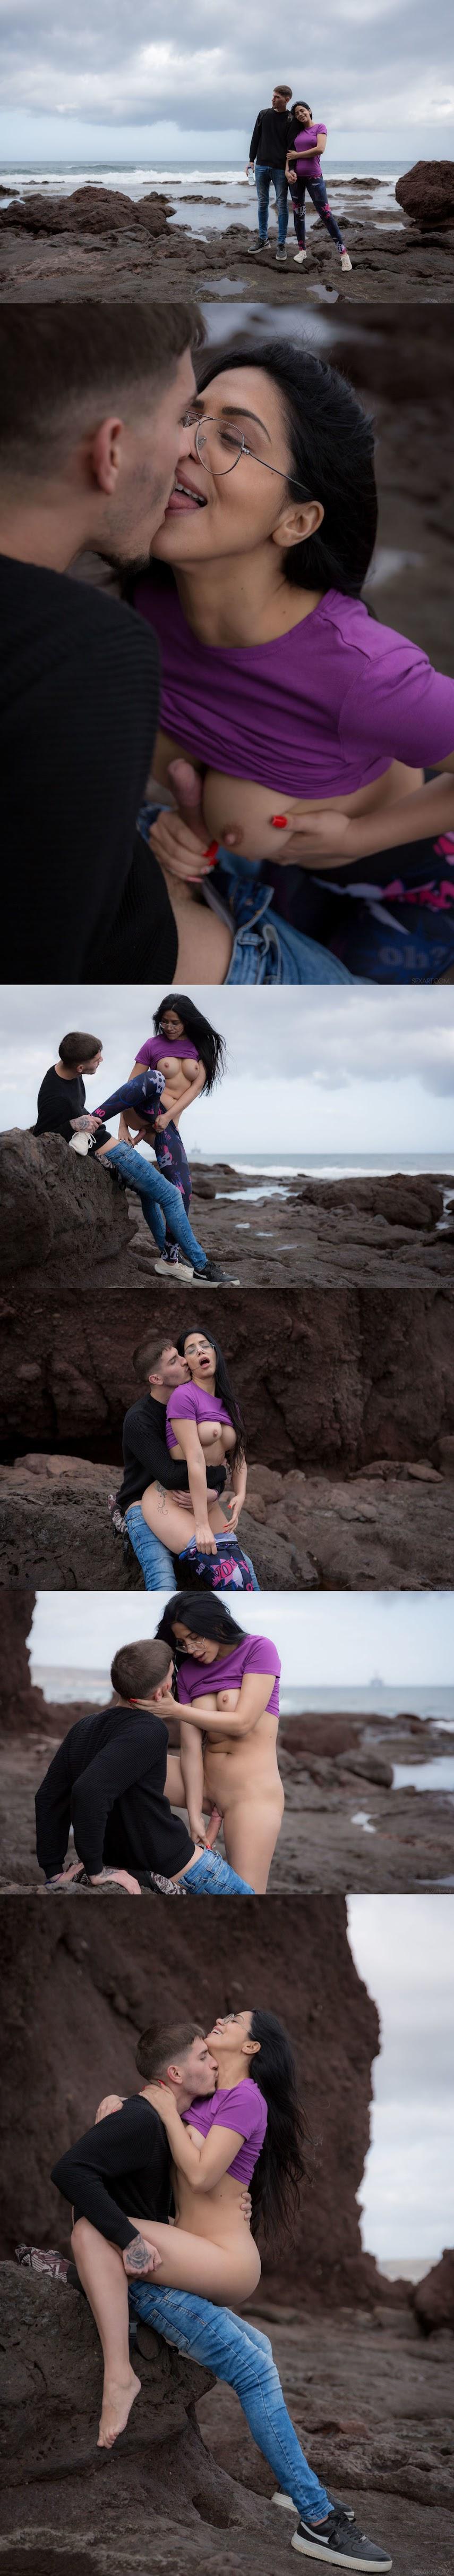 [Sex-Art] Chris Torres, Julia De Lucia - Unrestrained